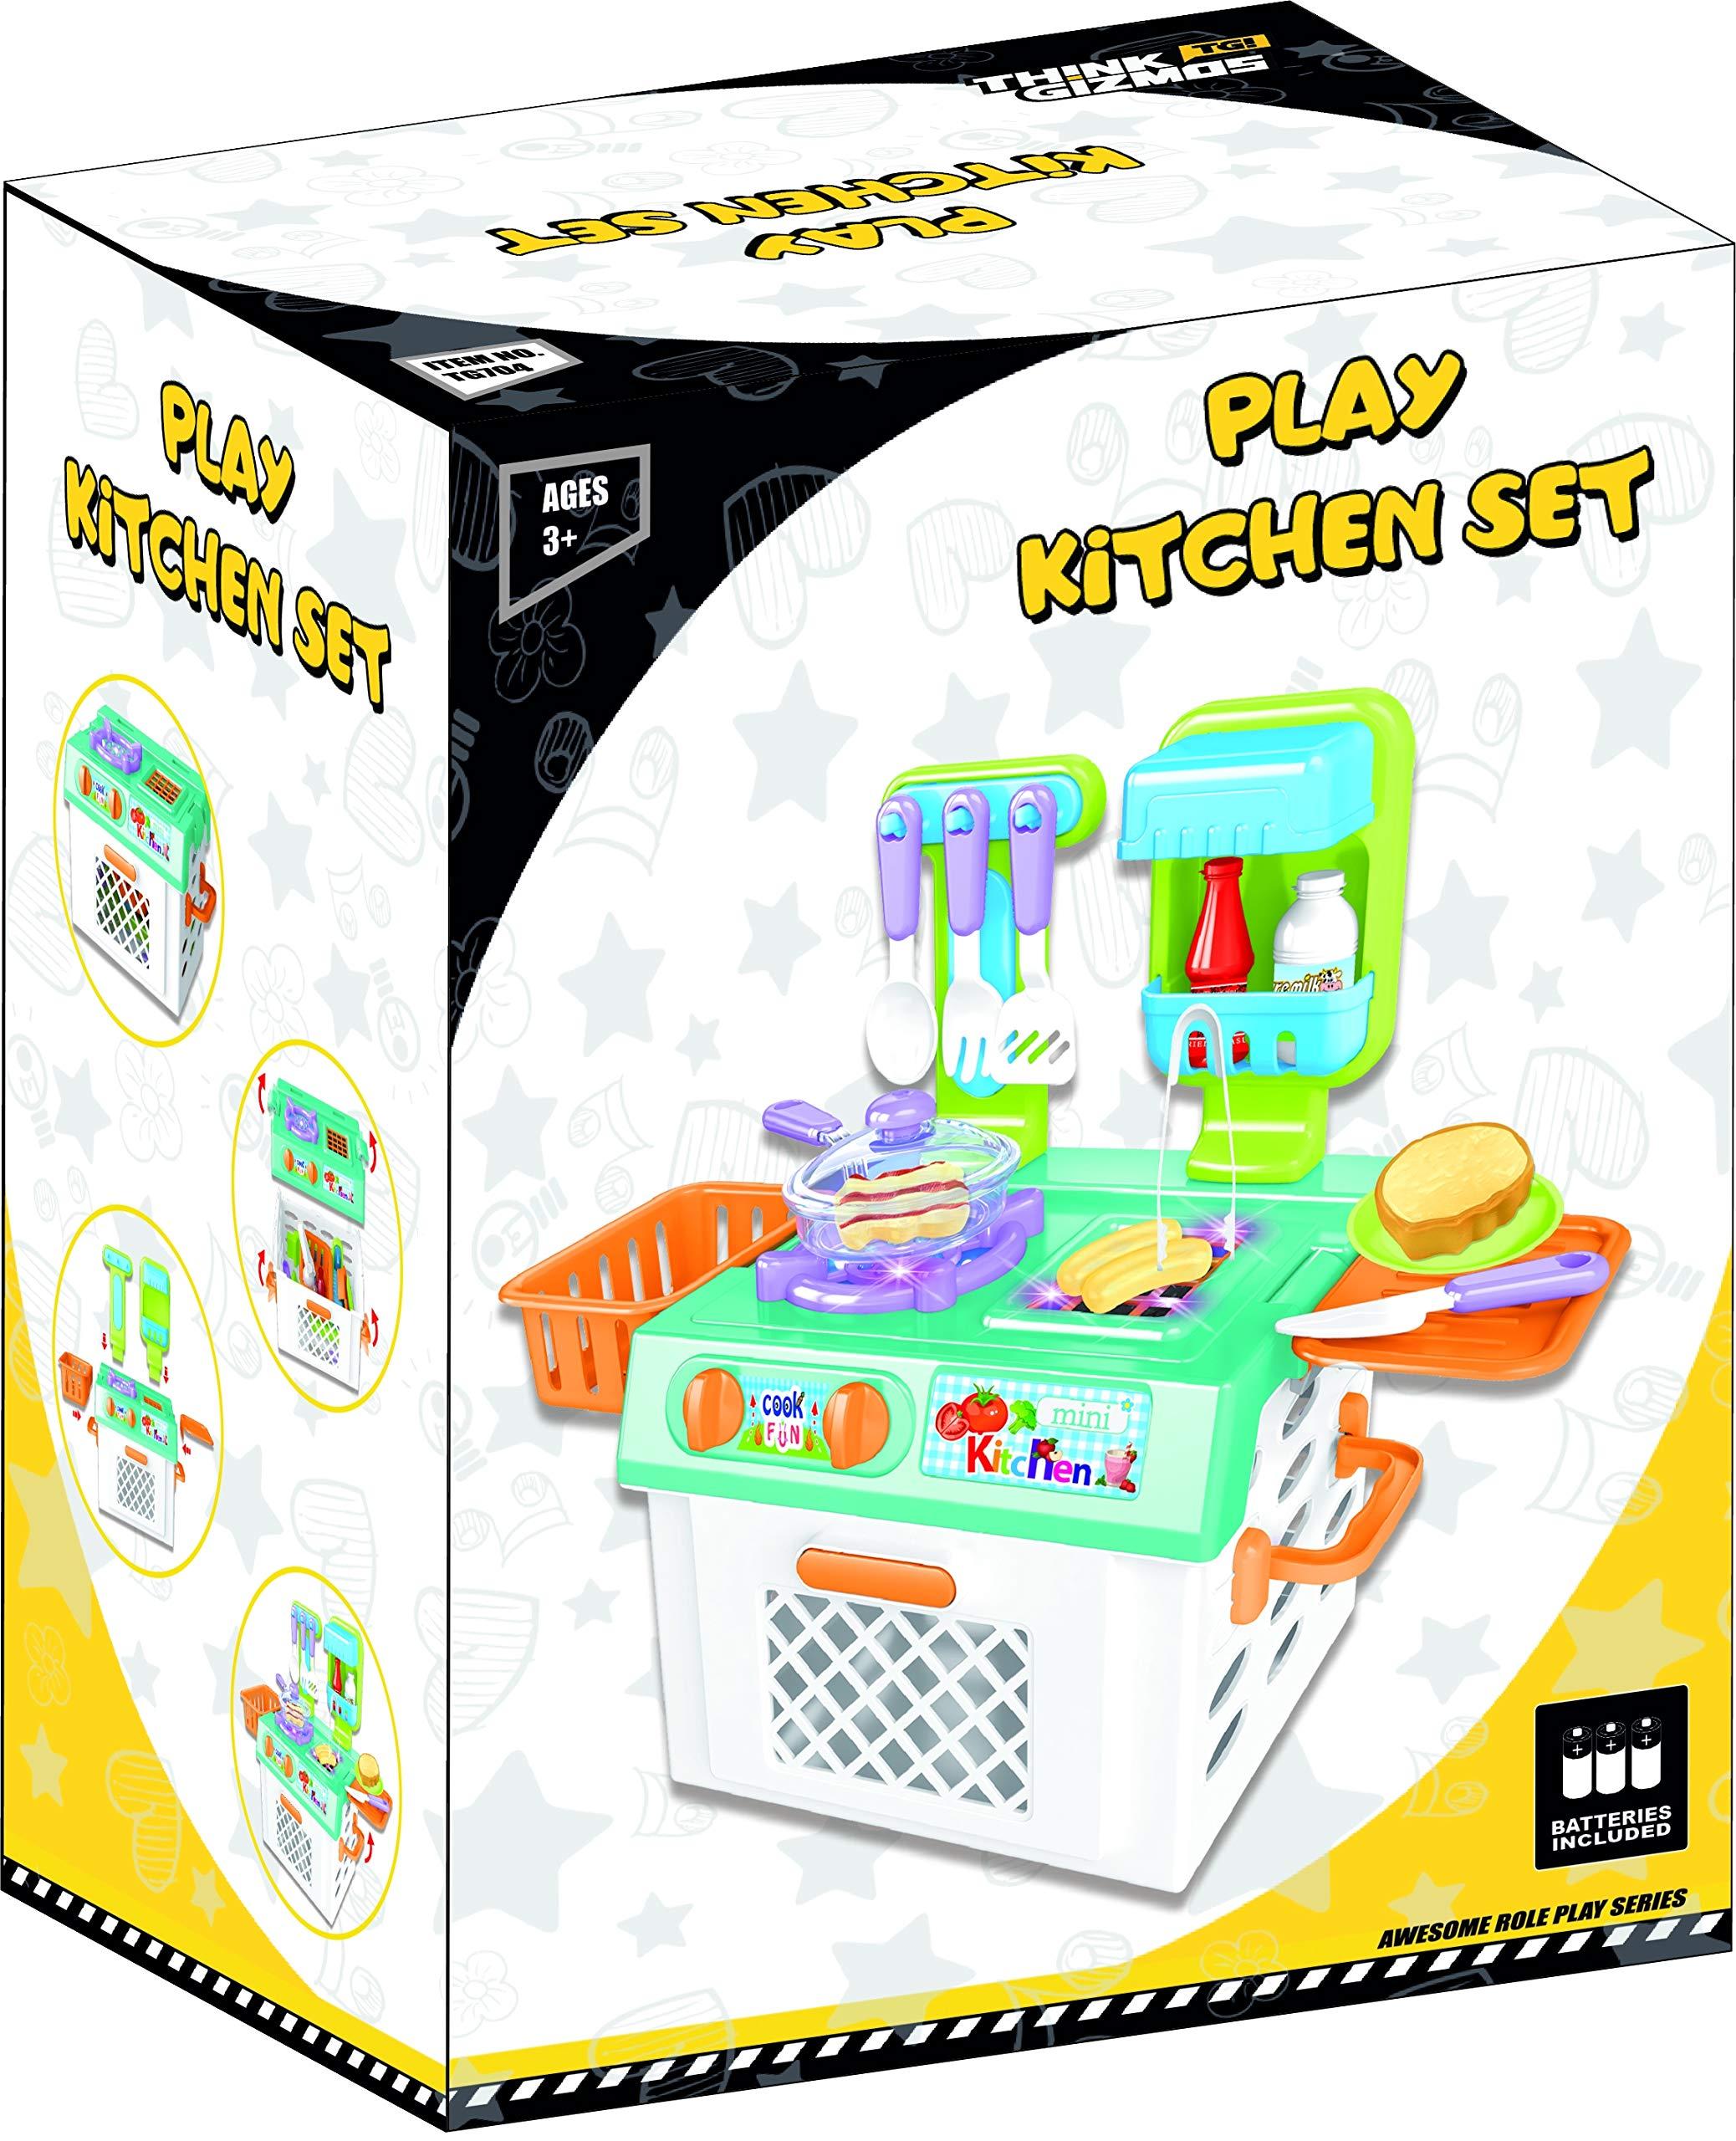 Tg704 play kitchen set